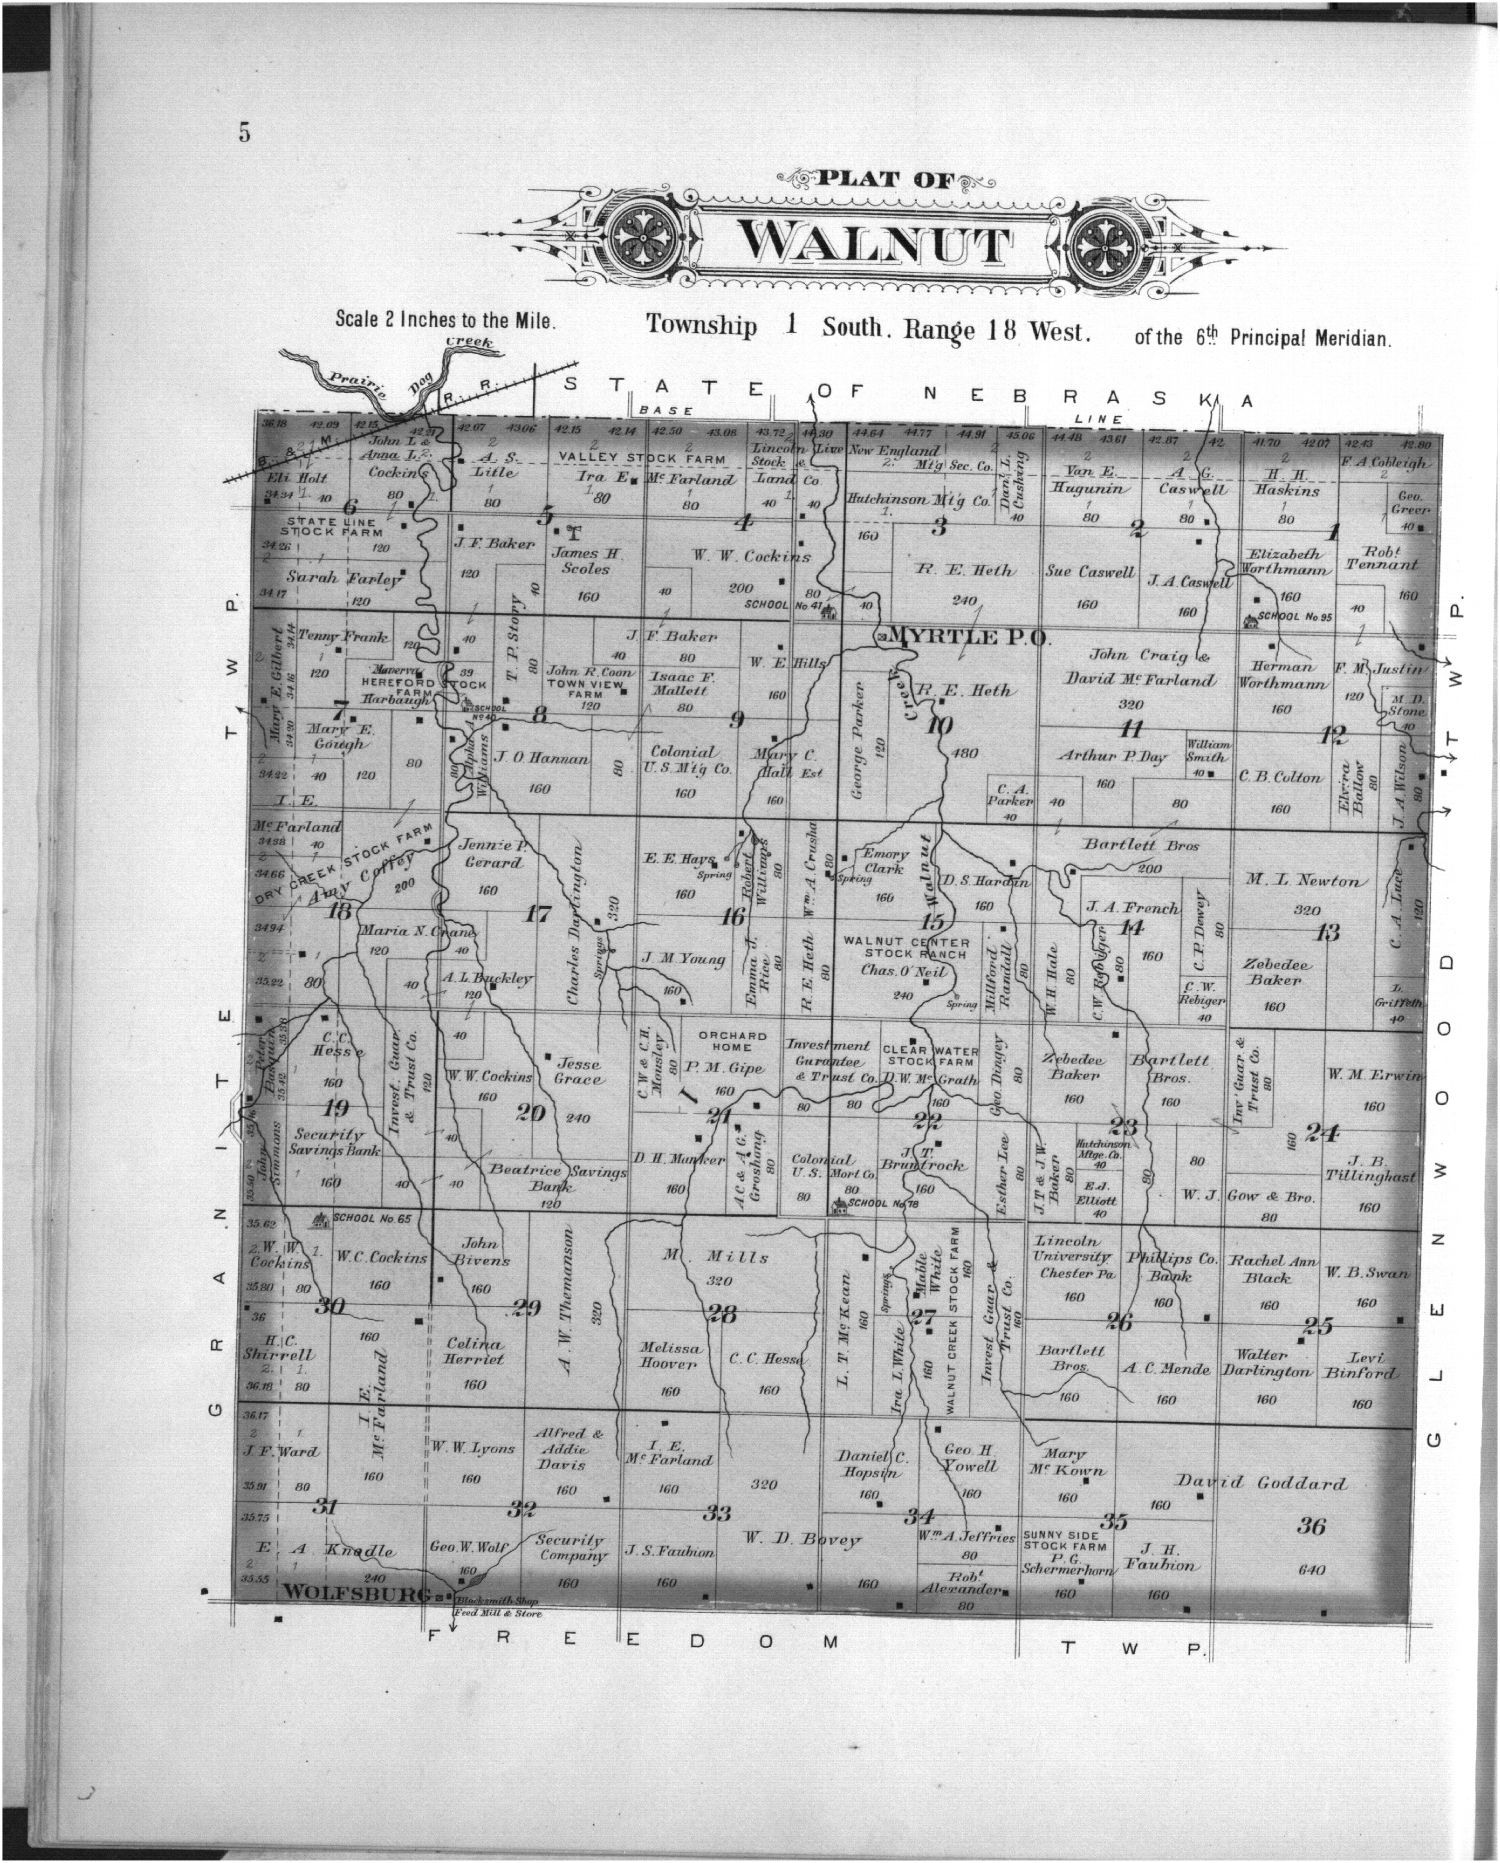 Plat book, Phillips County, Kansas - 5